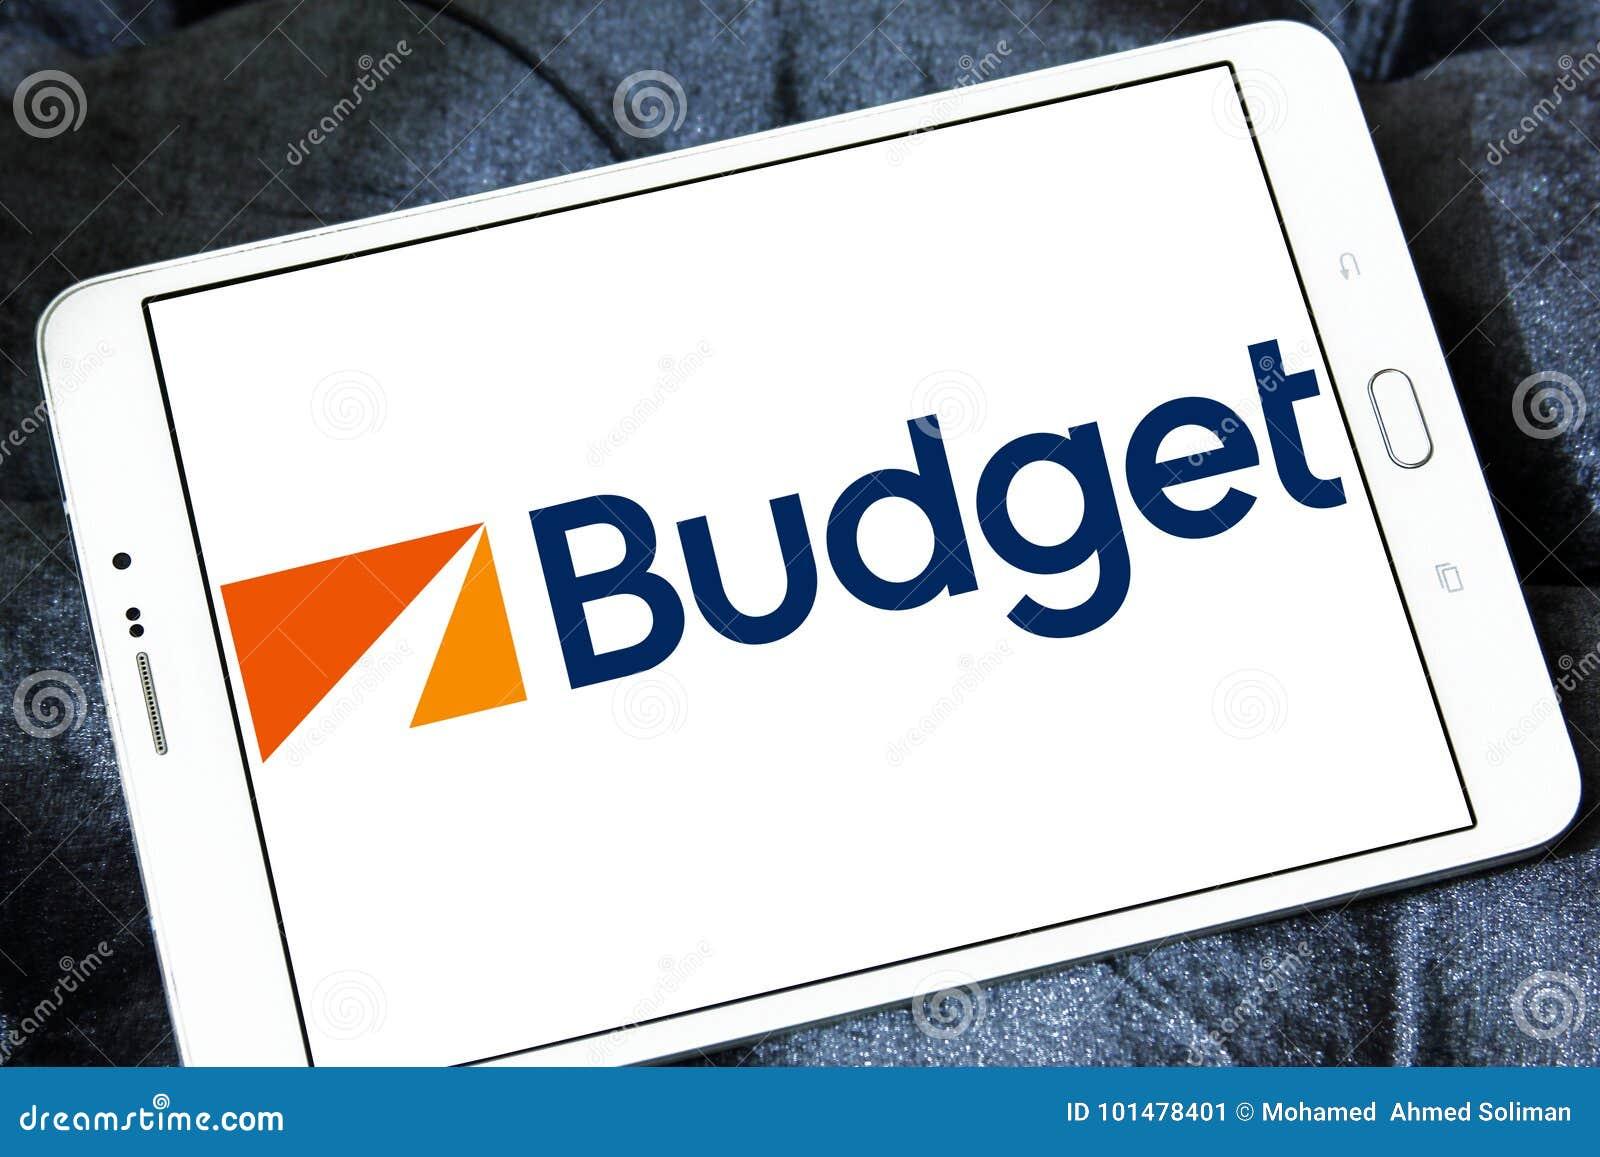 Budget Rental Car Monroe La Airport